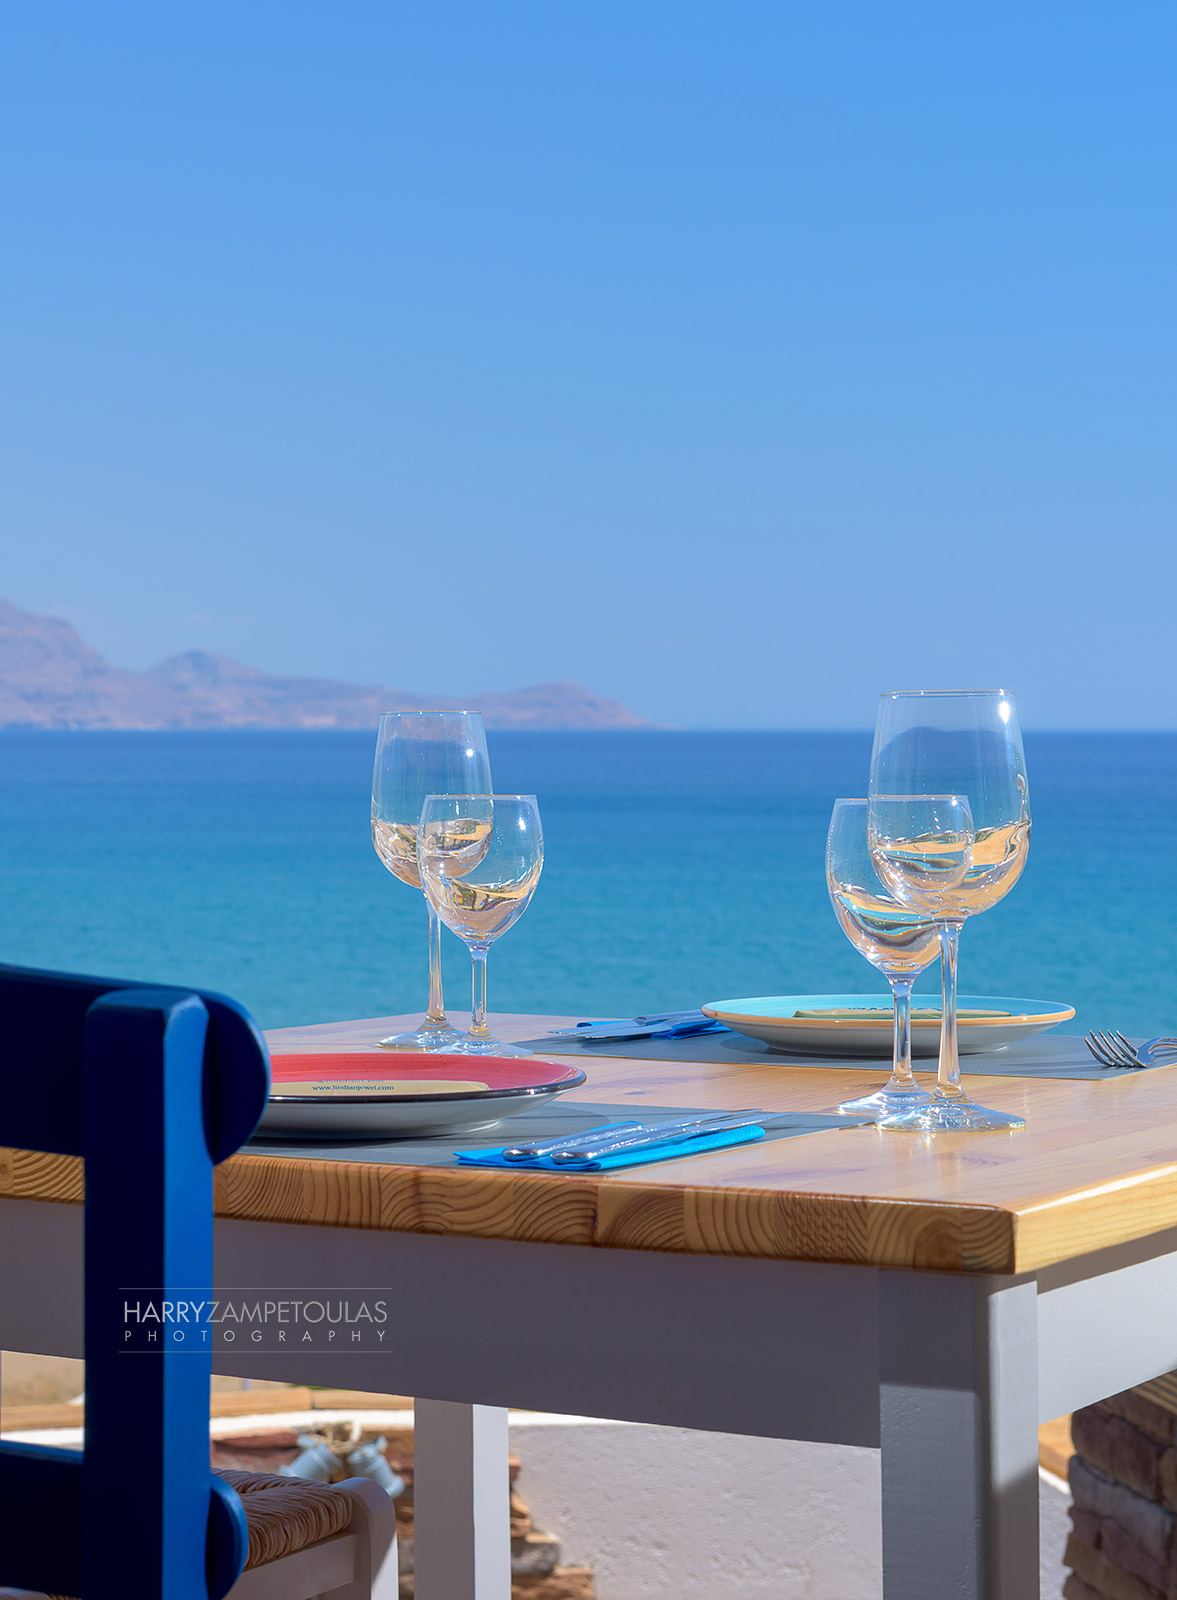 Lindian Jewel Hotel & Villas – Hotel Photography Harry Zampetoulas